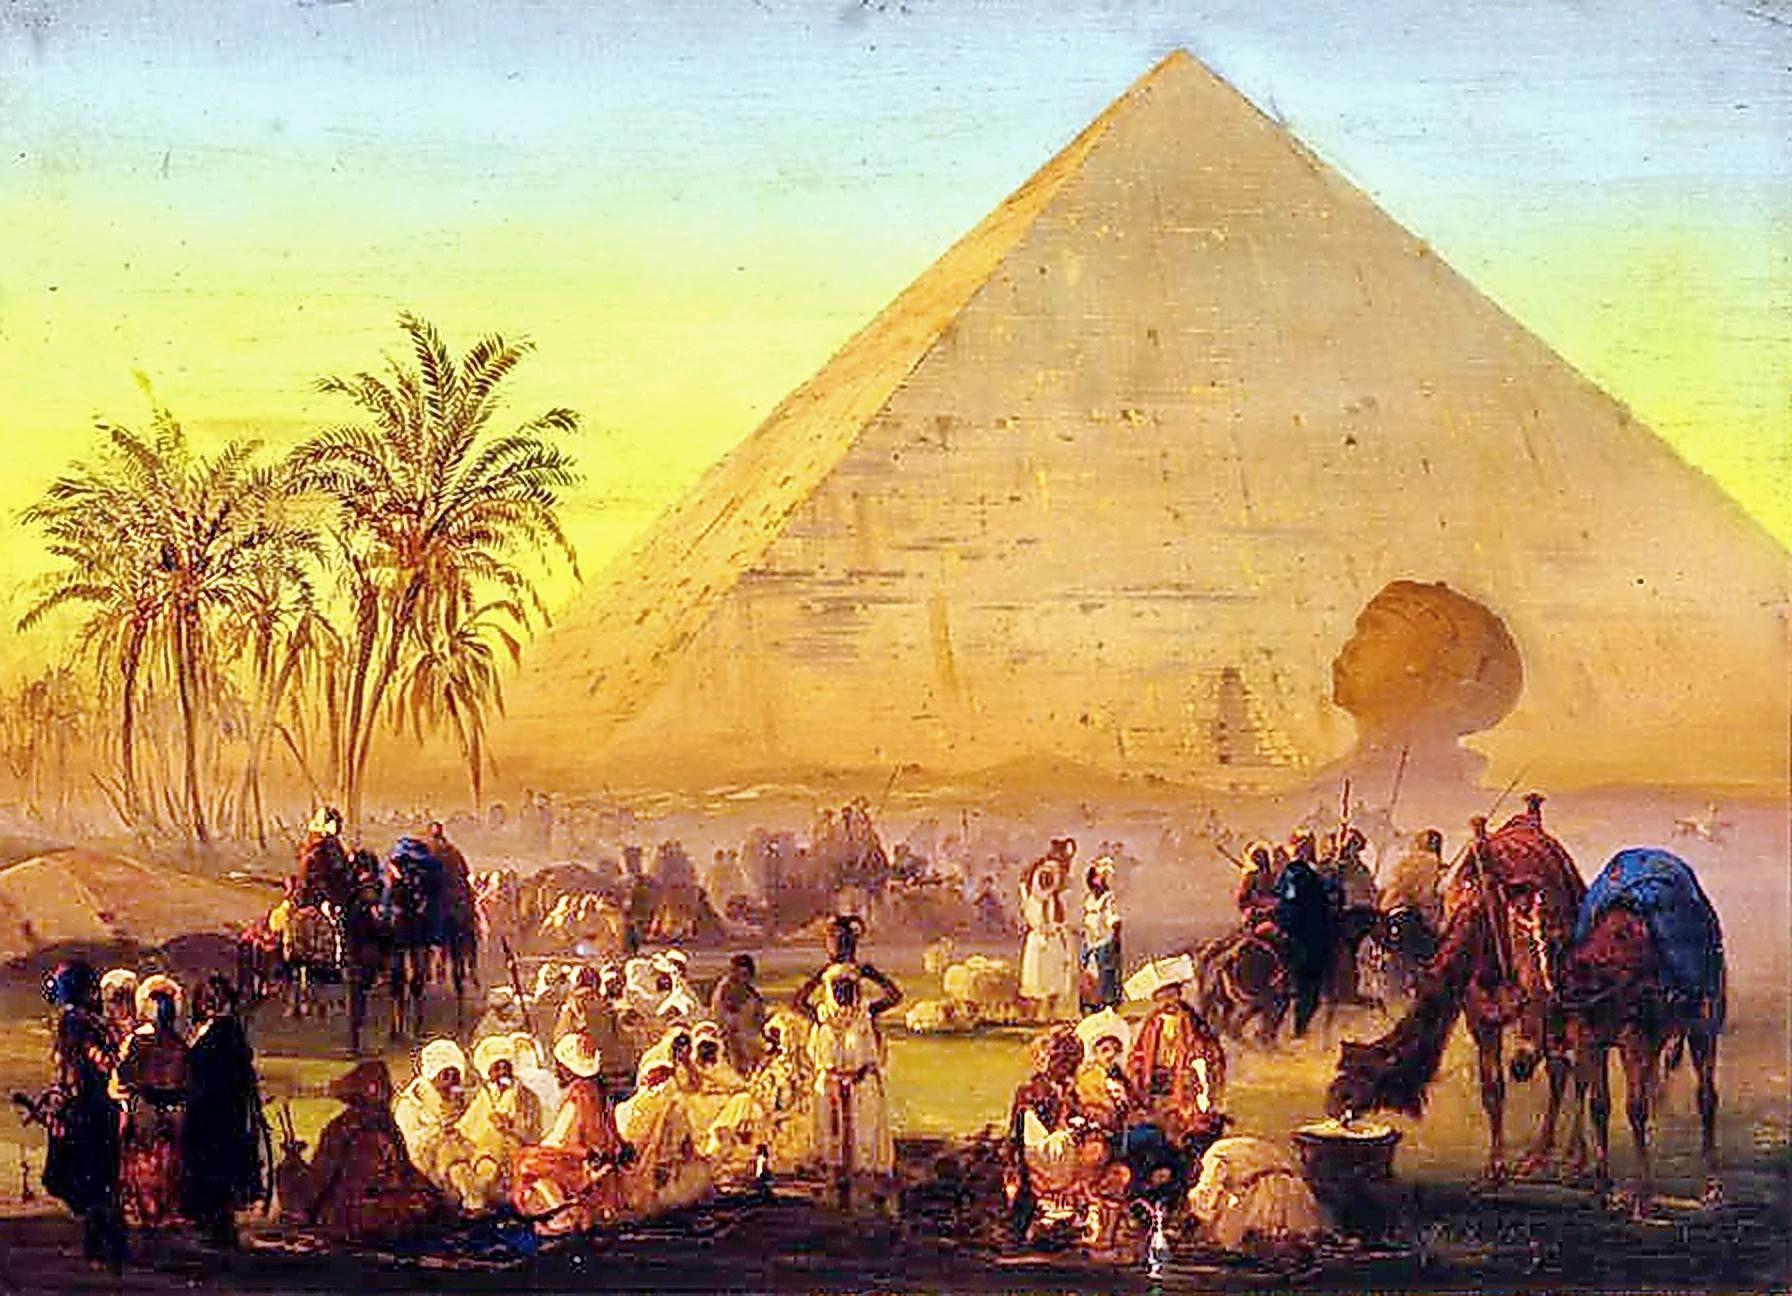 Egypt Wall Art Egypt Decor Giza Pyramids Egypt Art Interior Decor FRAMED Landscape Decor Egypt Pyramids